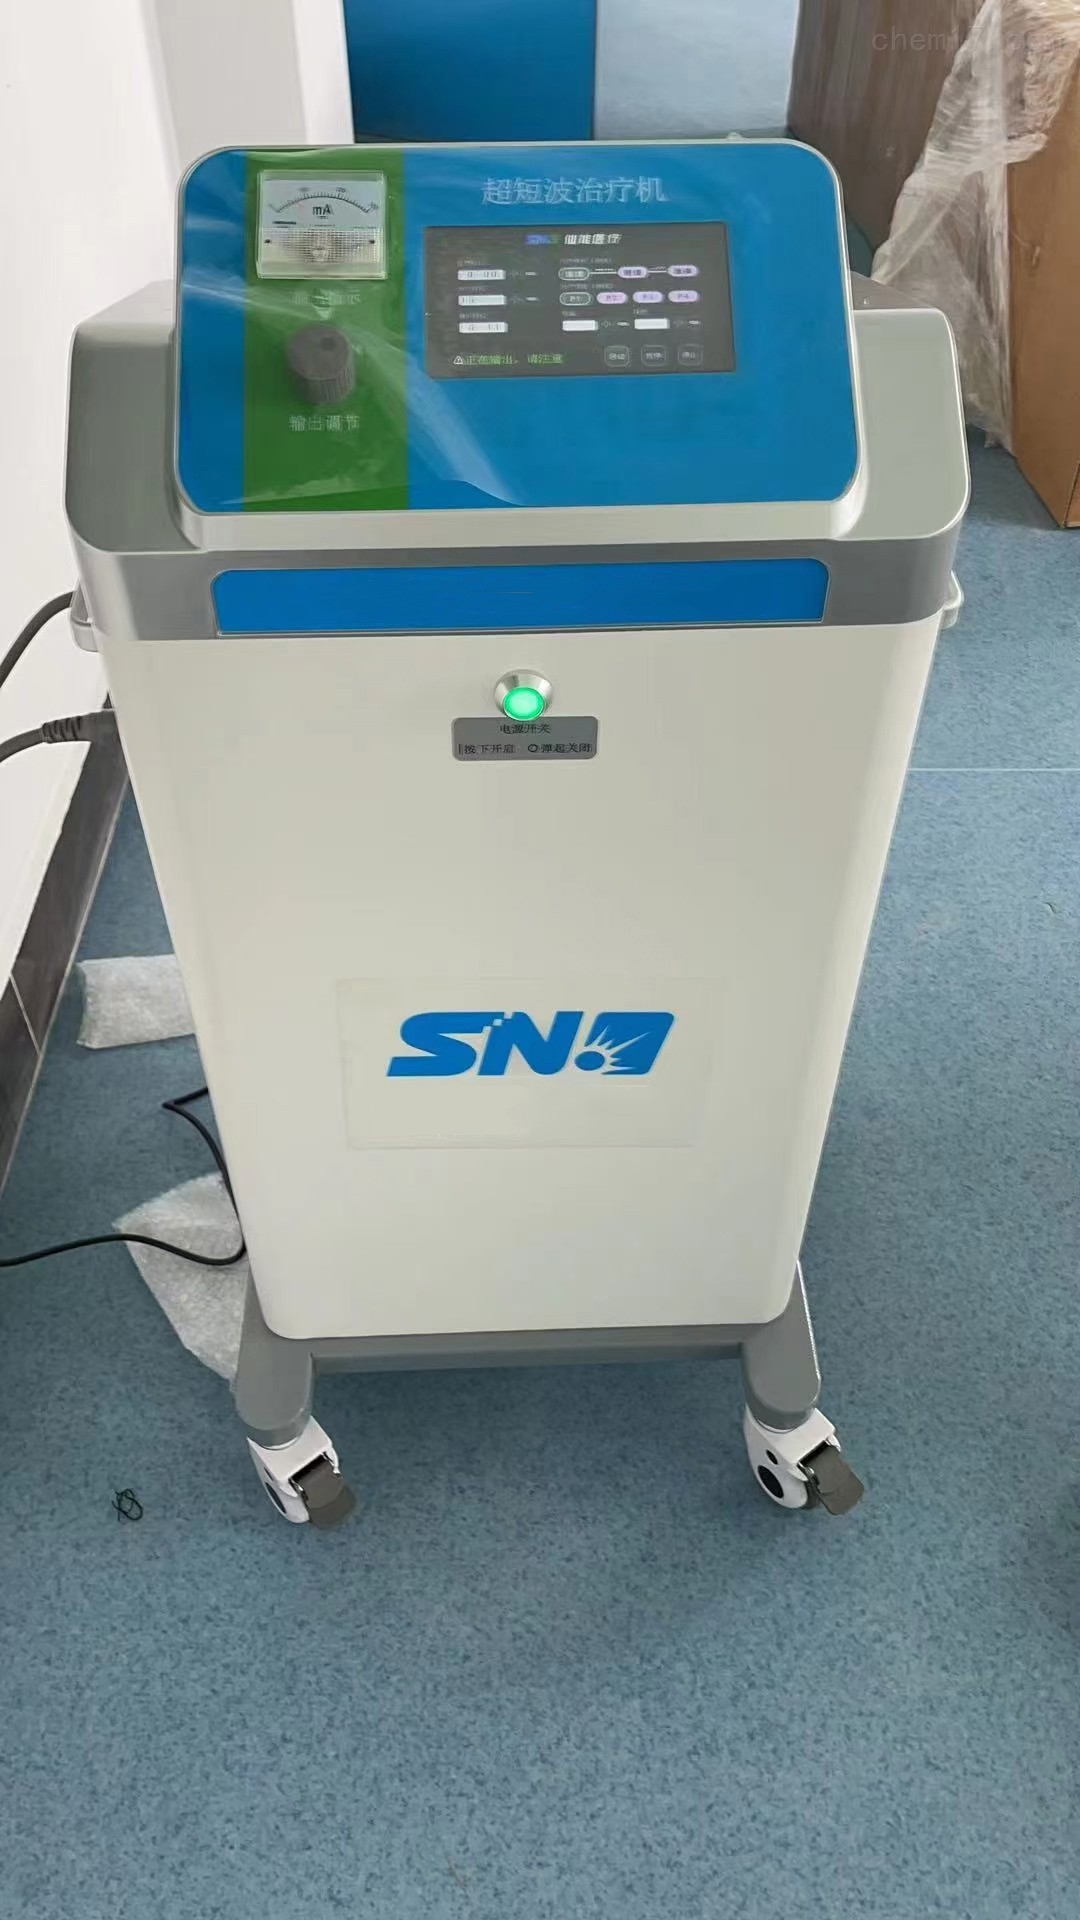 ZM-CDB-V型<strong>超短波治疗仪</strong>11.jpg